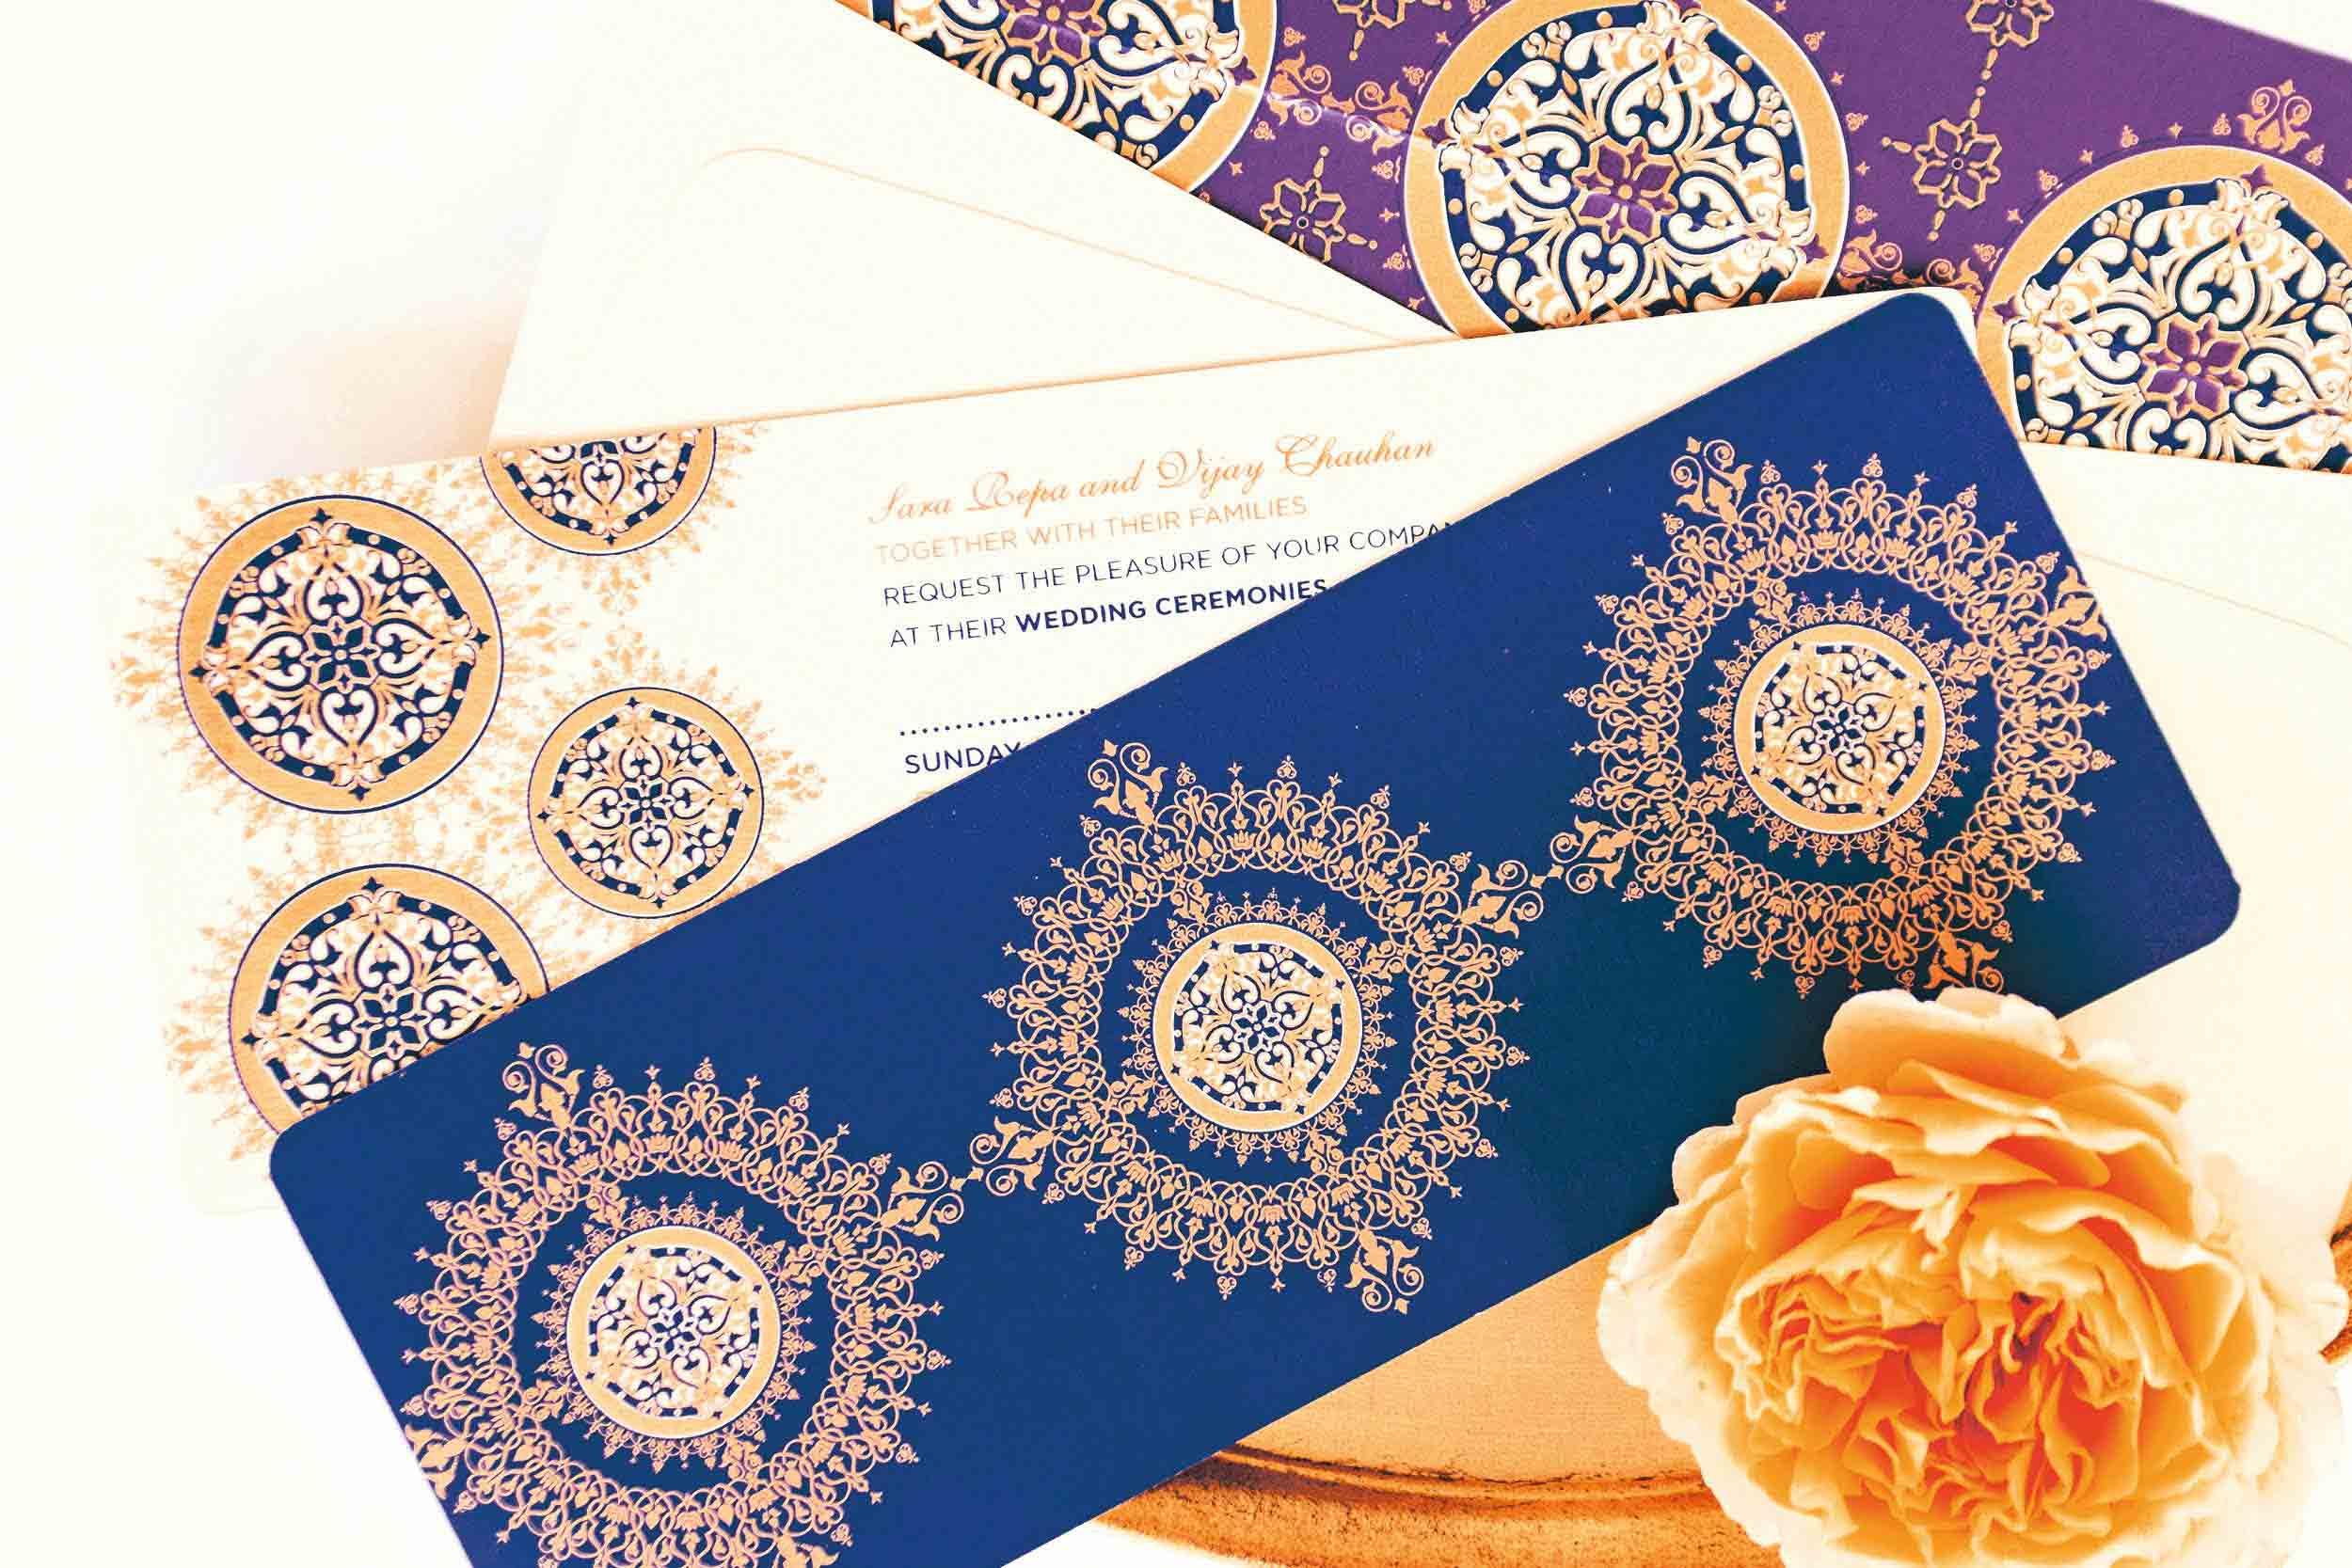 bespoke_wedding_invitation_mandala_ananyacards.com-01.jpg